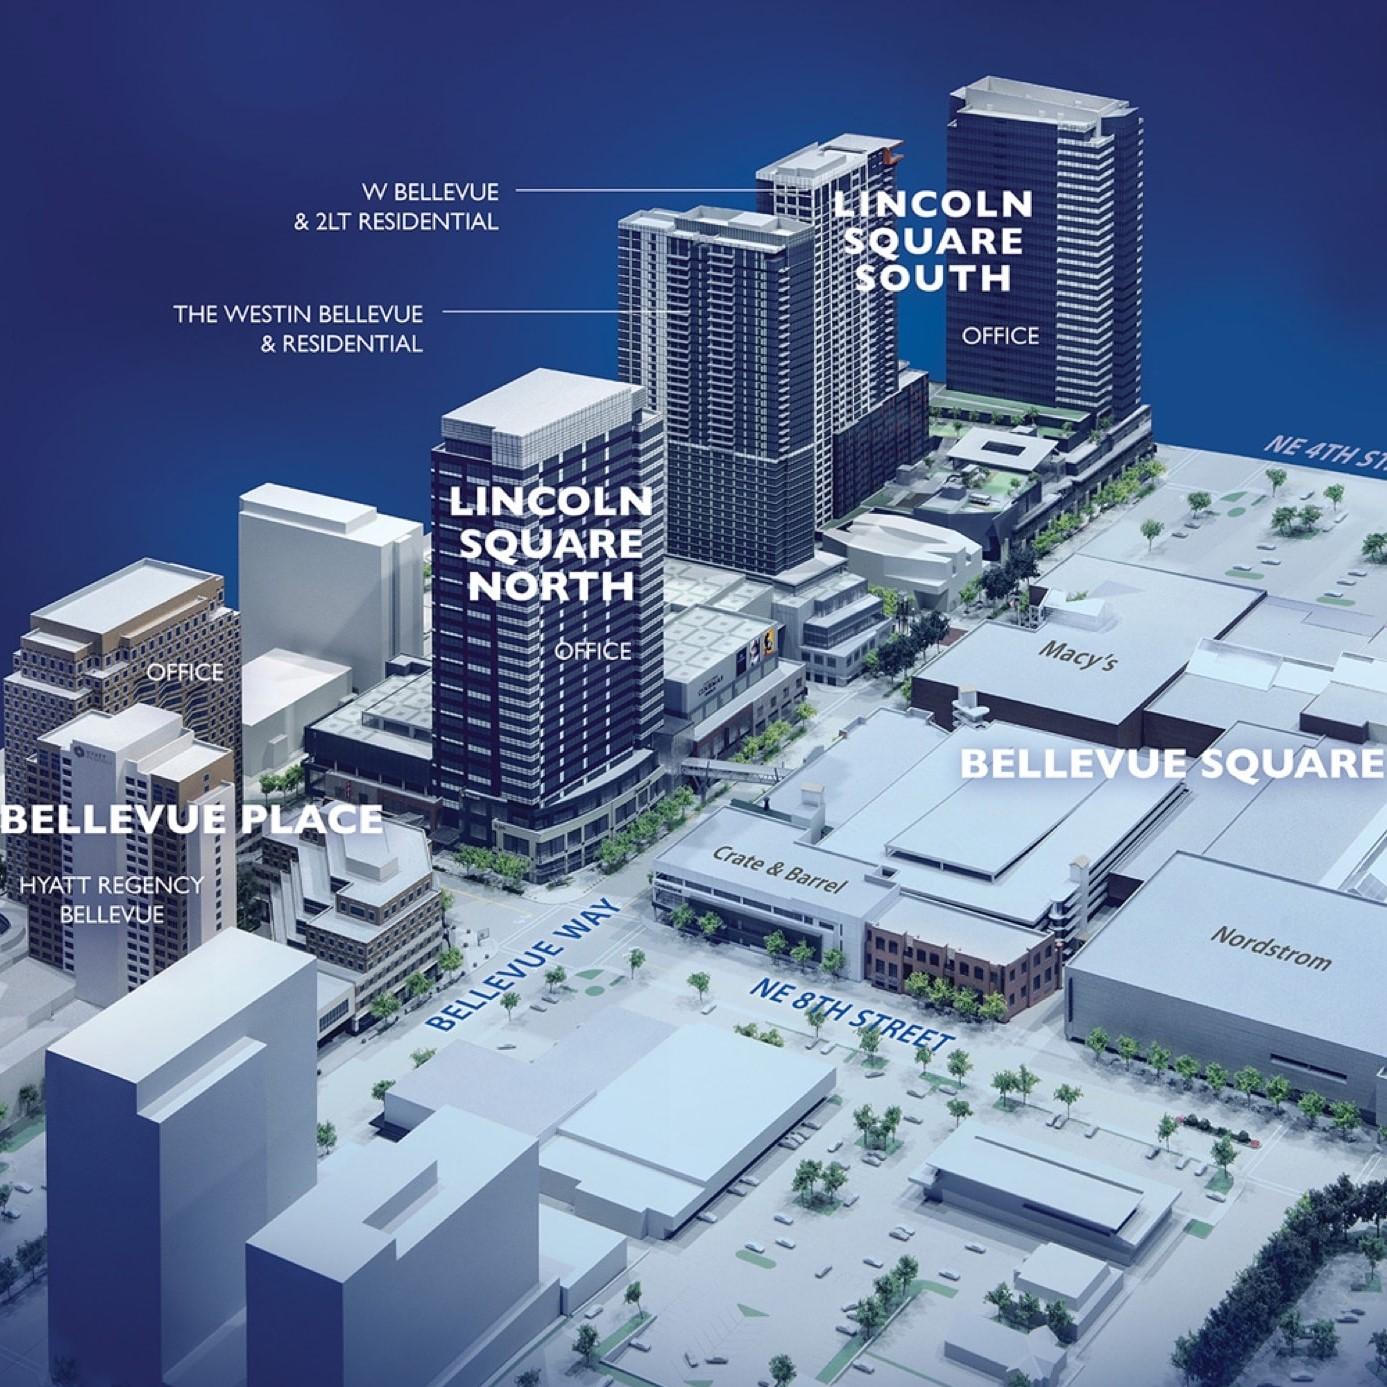 Lincoln Square South